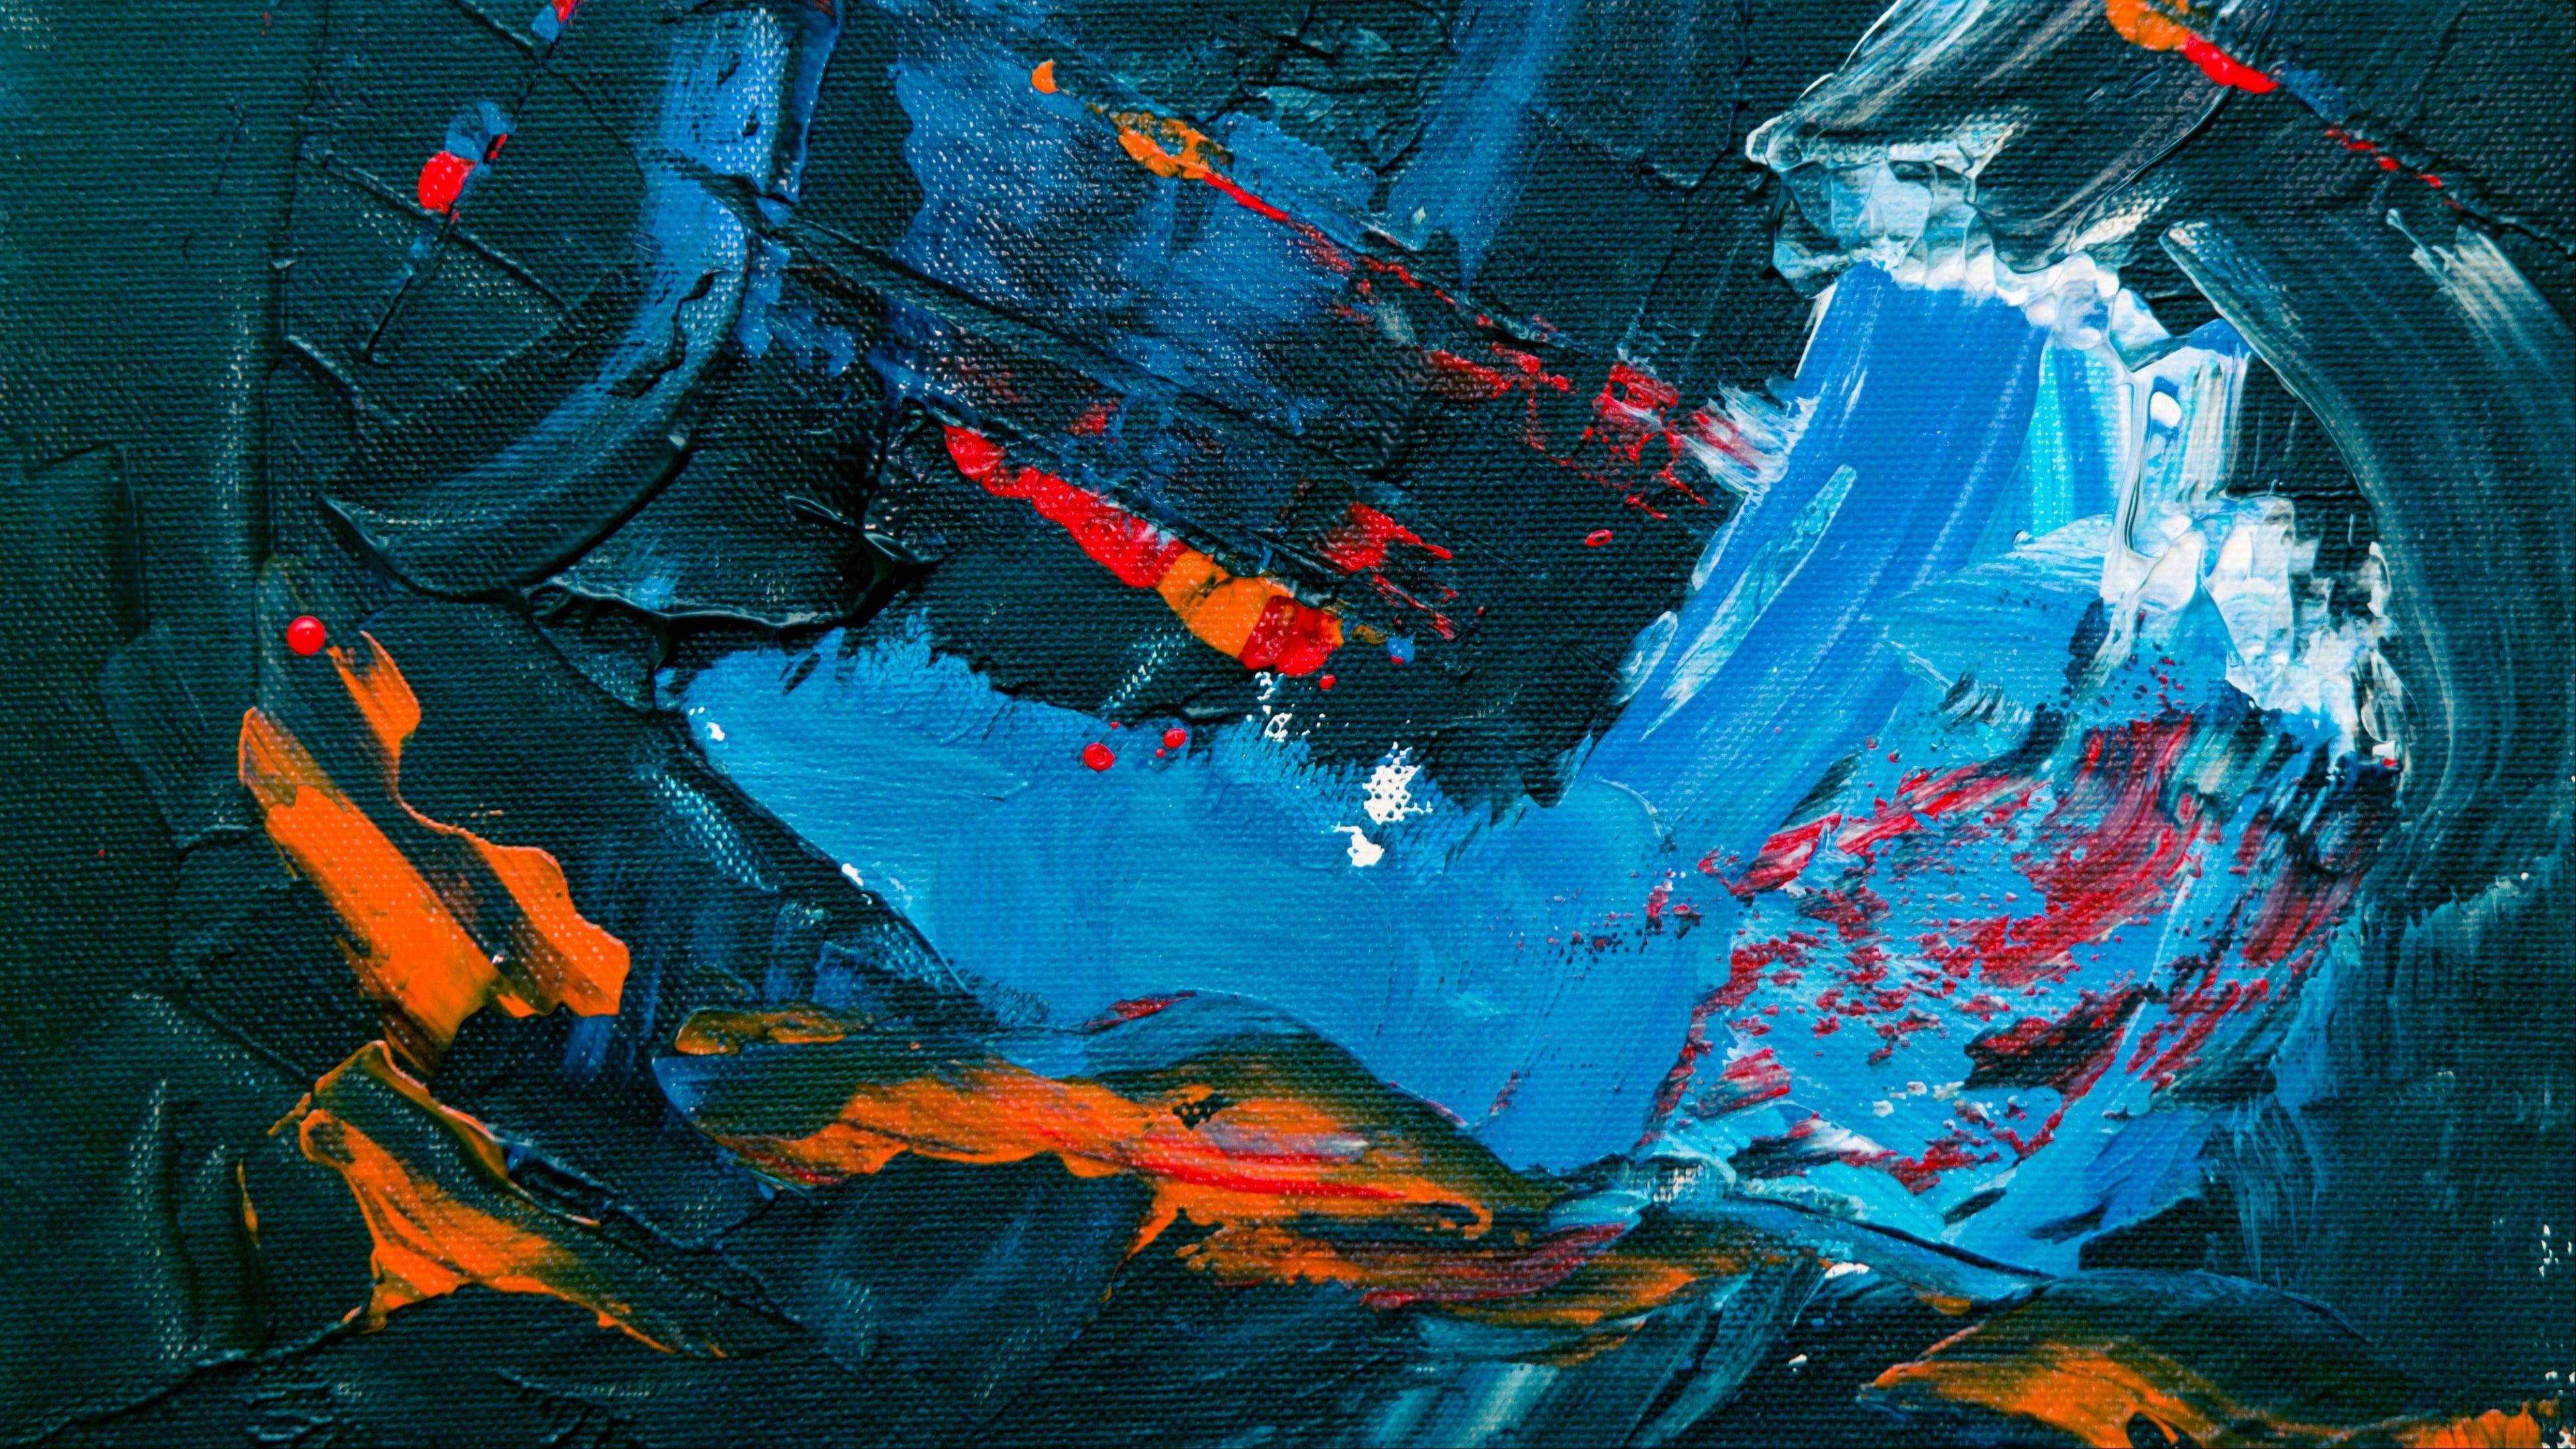 modern art abstract art painting painting art artwork